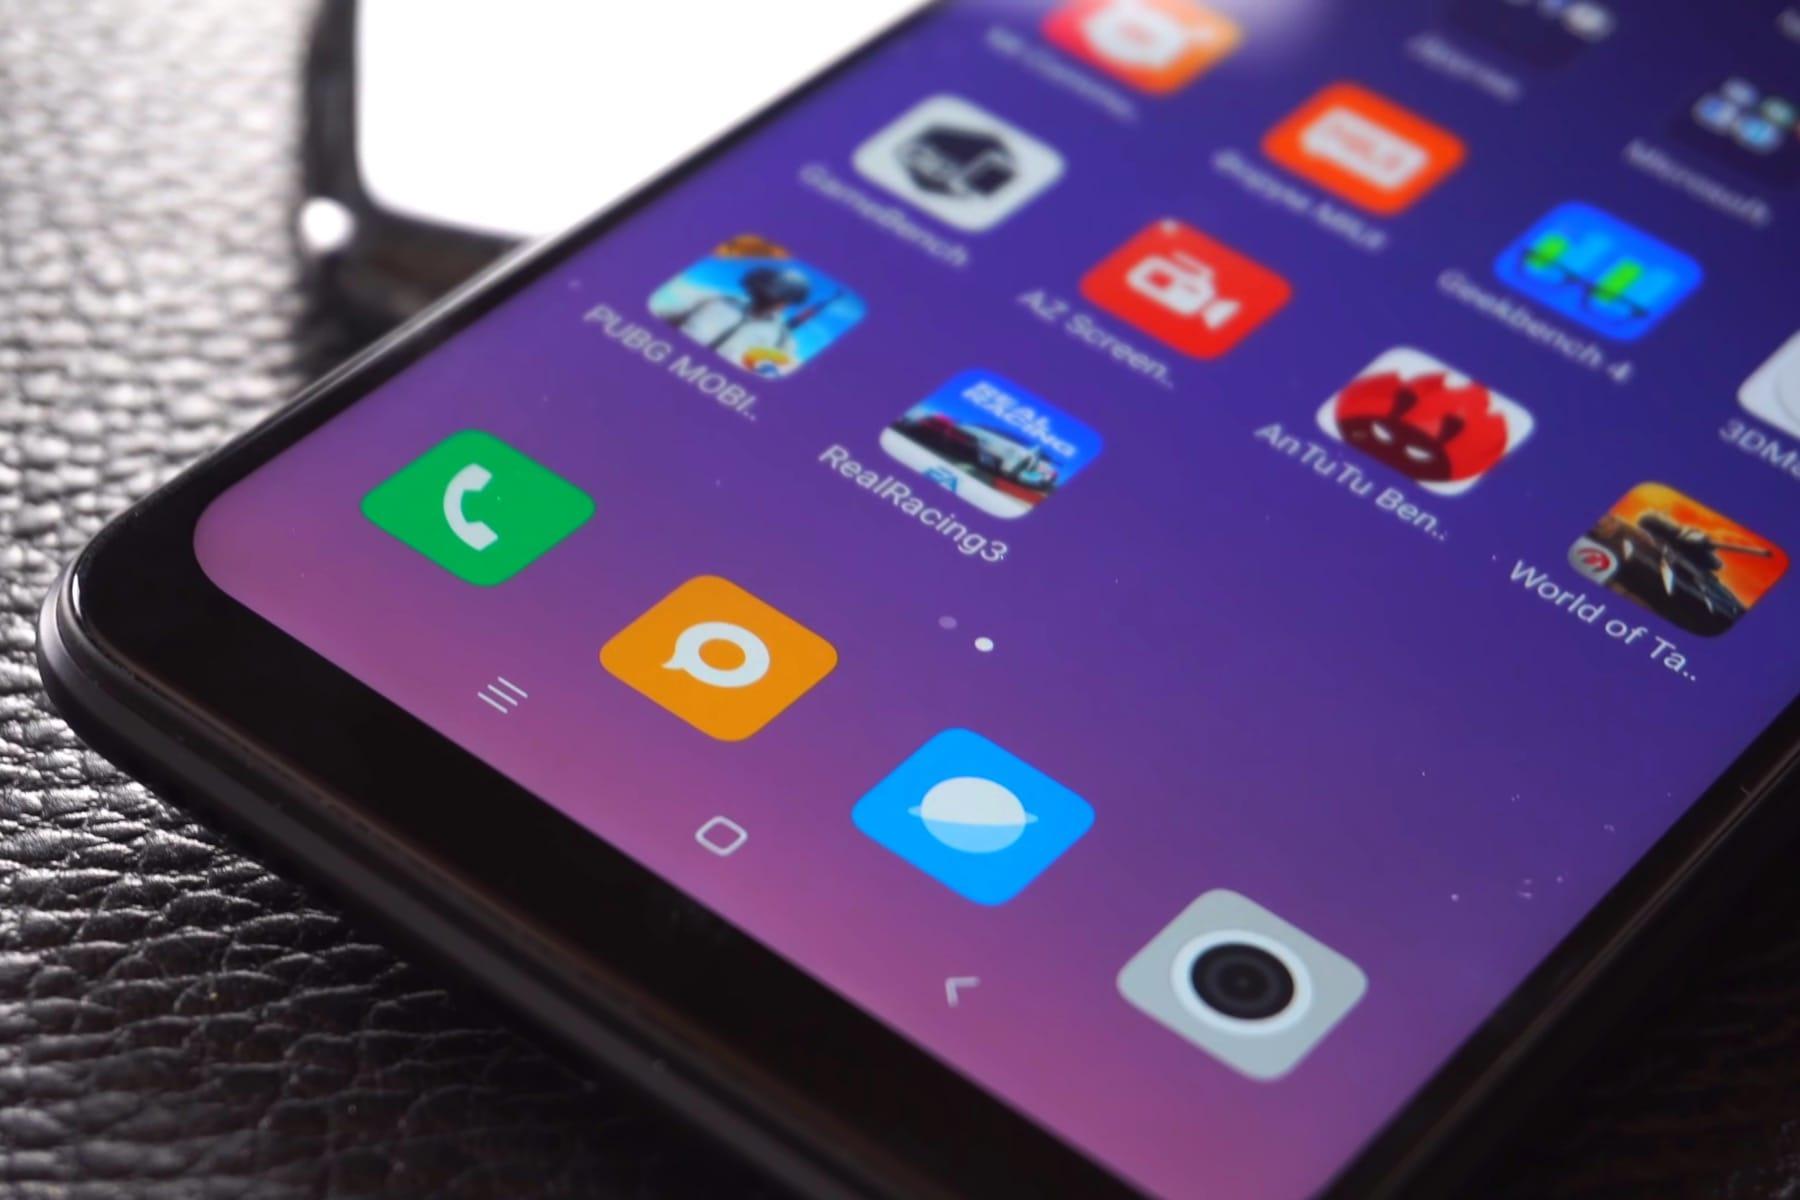 Googliercom Android Search Date 2018 11 05 Nokia Lumia 625 8gb Resmi Orange